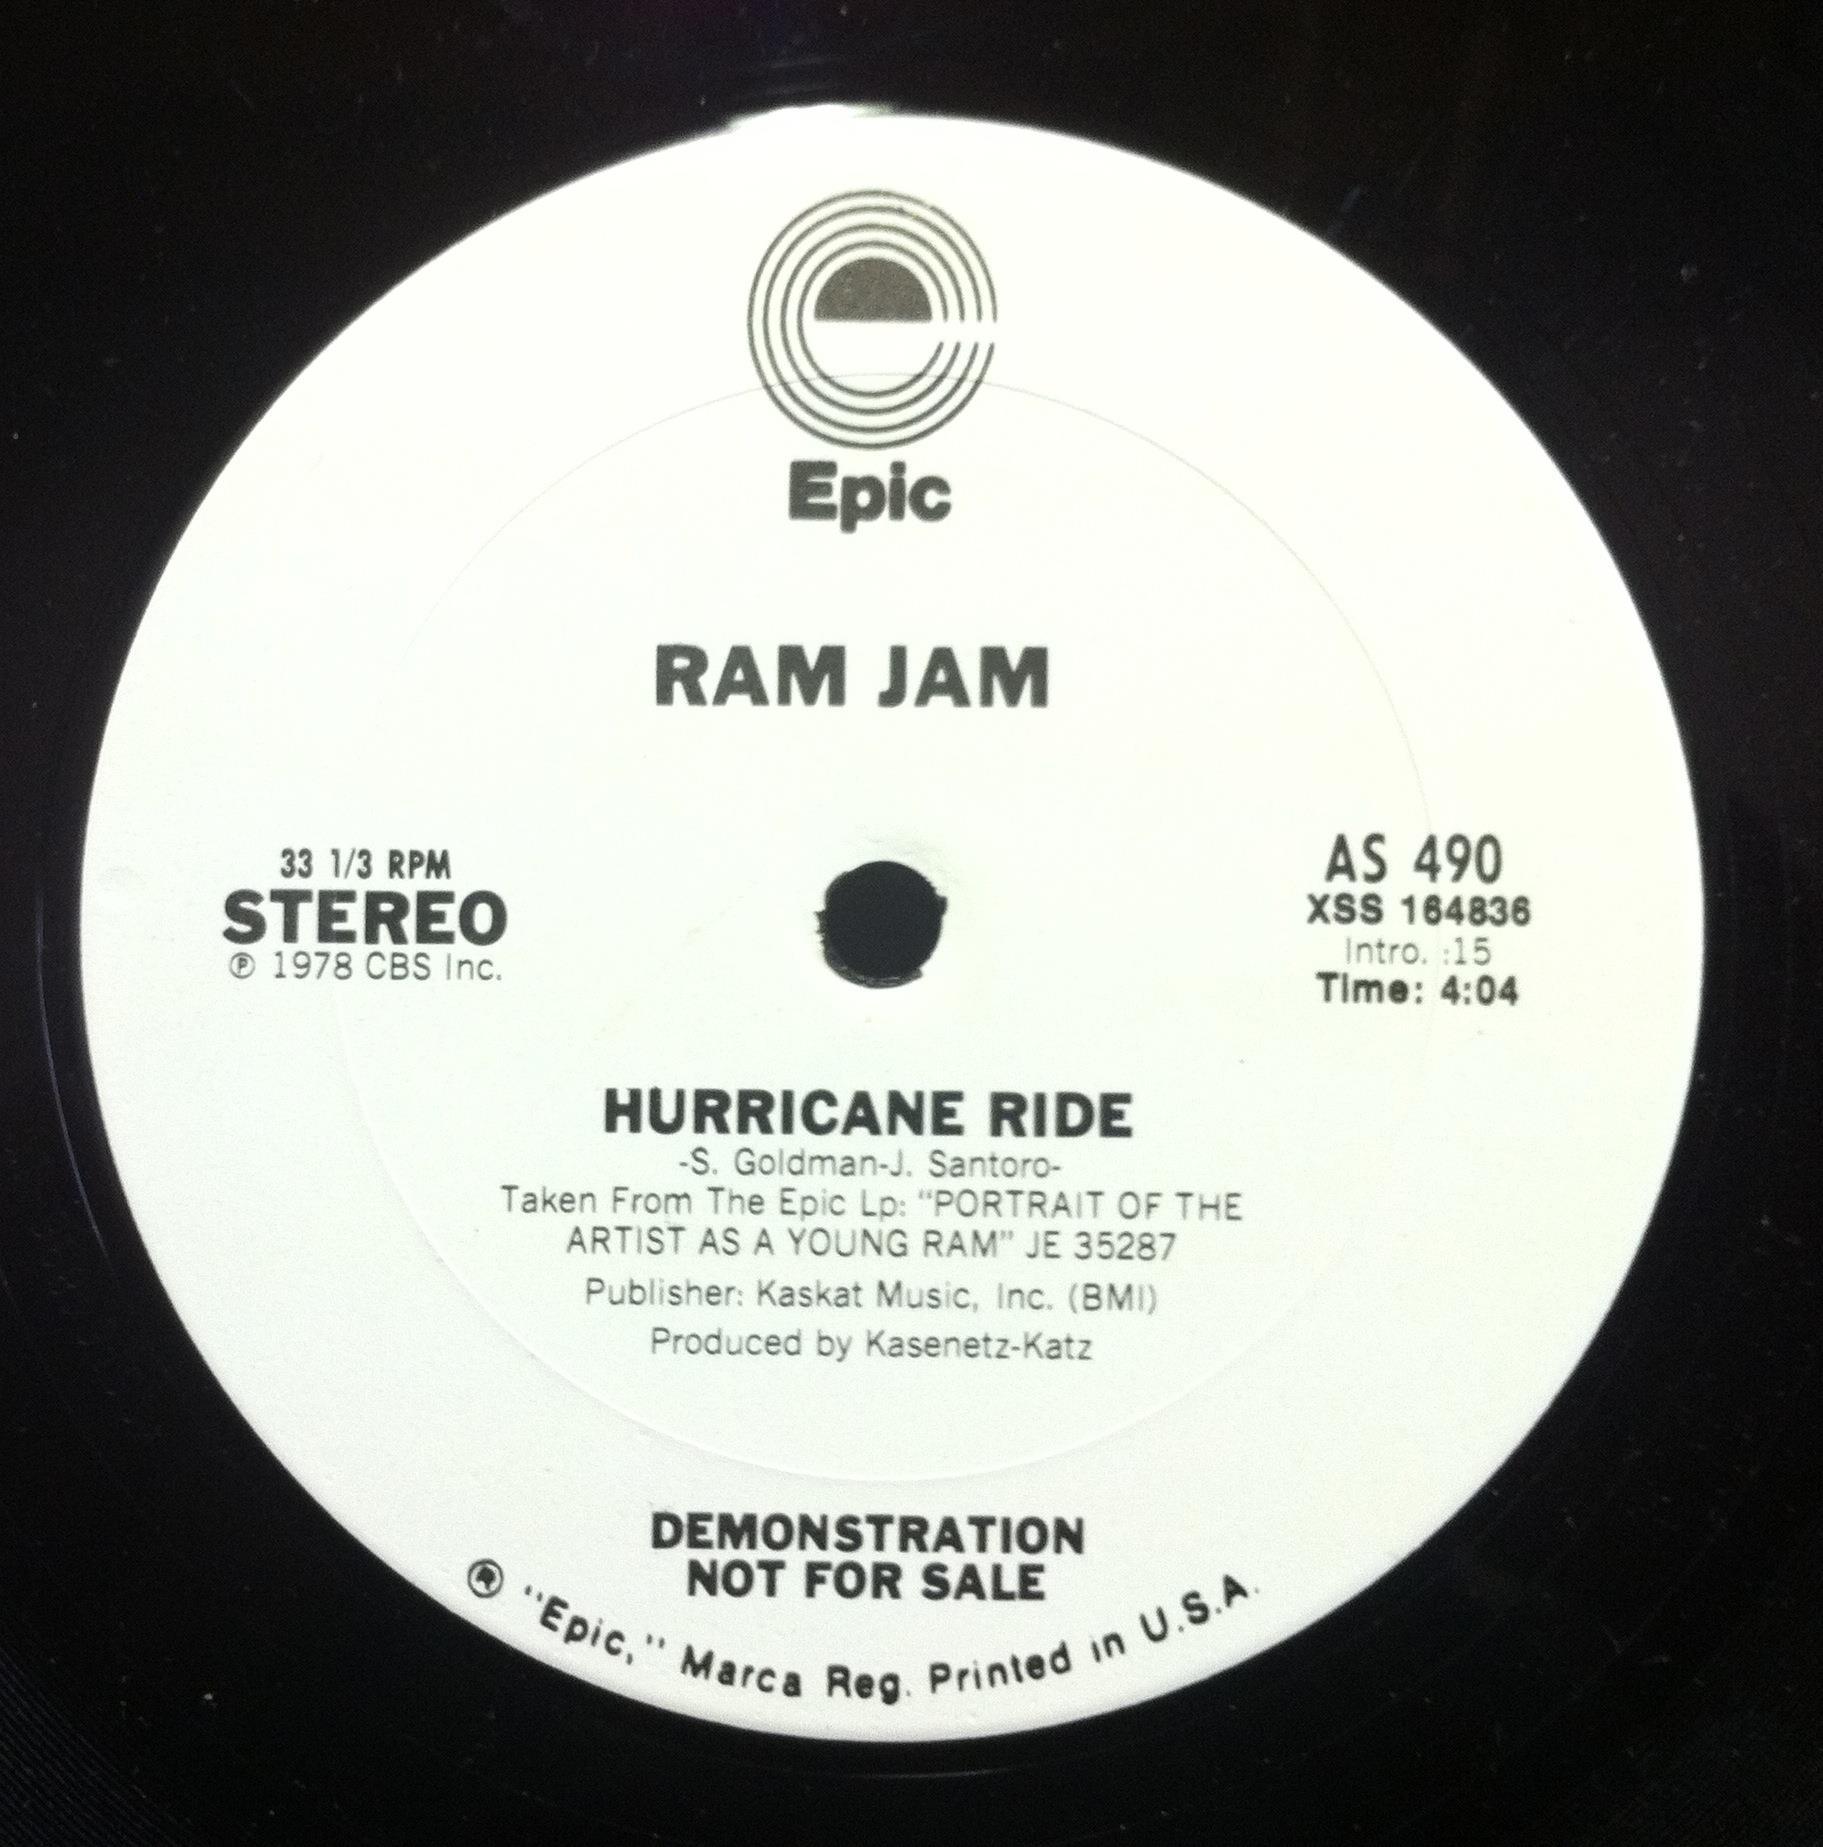 "RAM JAM - Ram Jam Hurricane Ride 12"" Vg+ Wl Promo Wlp As 490 Vinyl 1978 Record (hurricane Ride)"